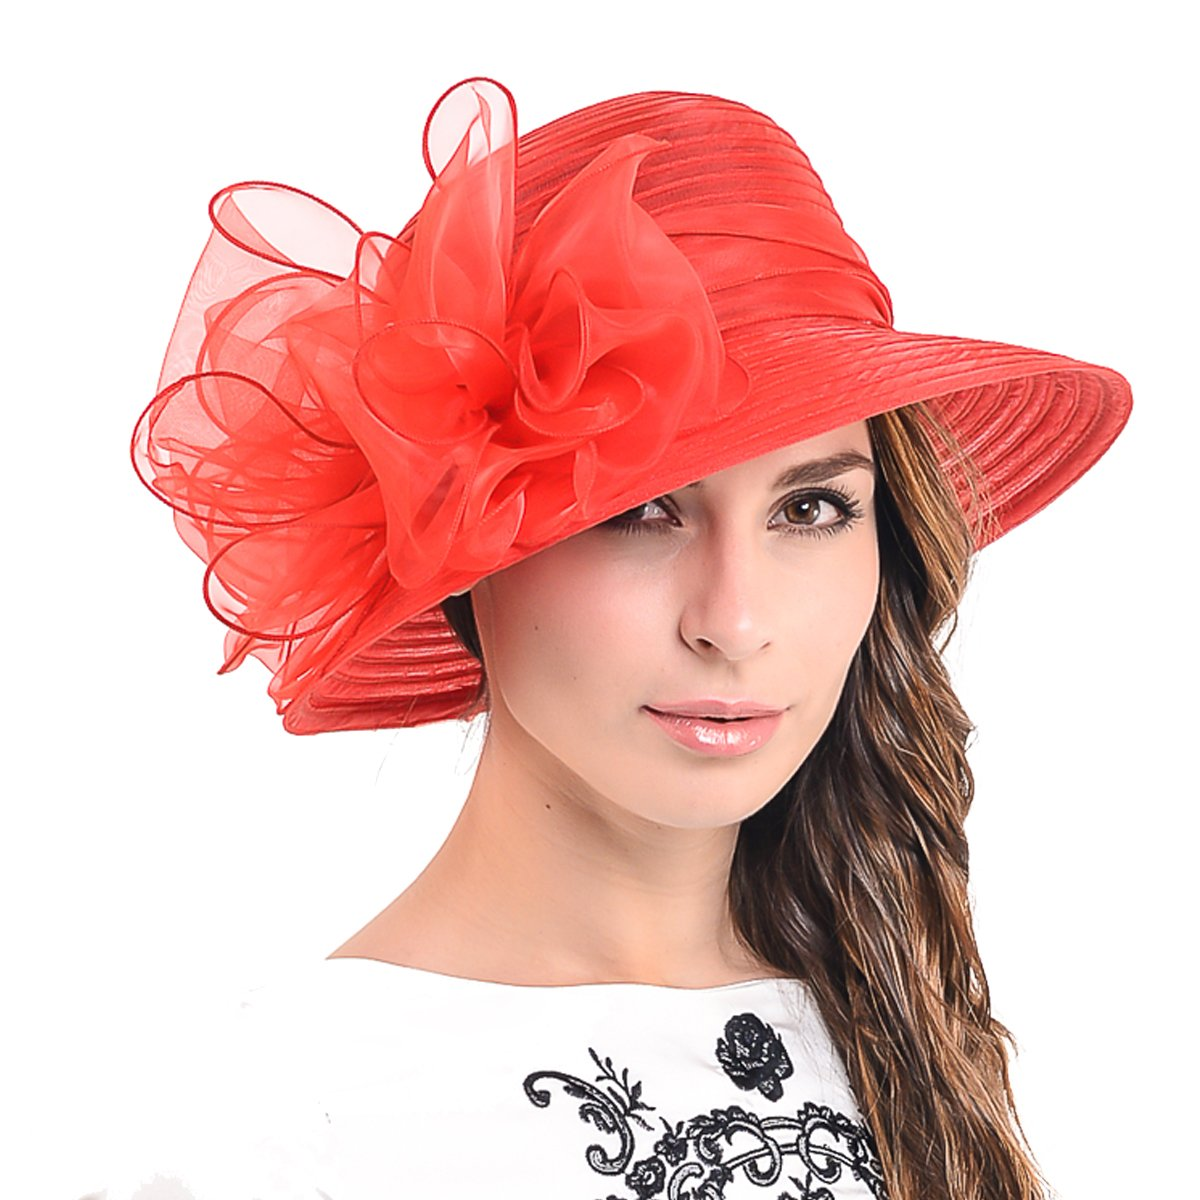 Ascot Derby Bowler Church Cloche Hat Bowknot Bridal Dress Party Cap S051